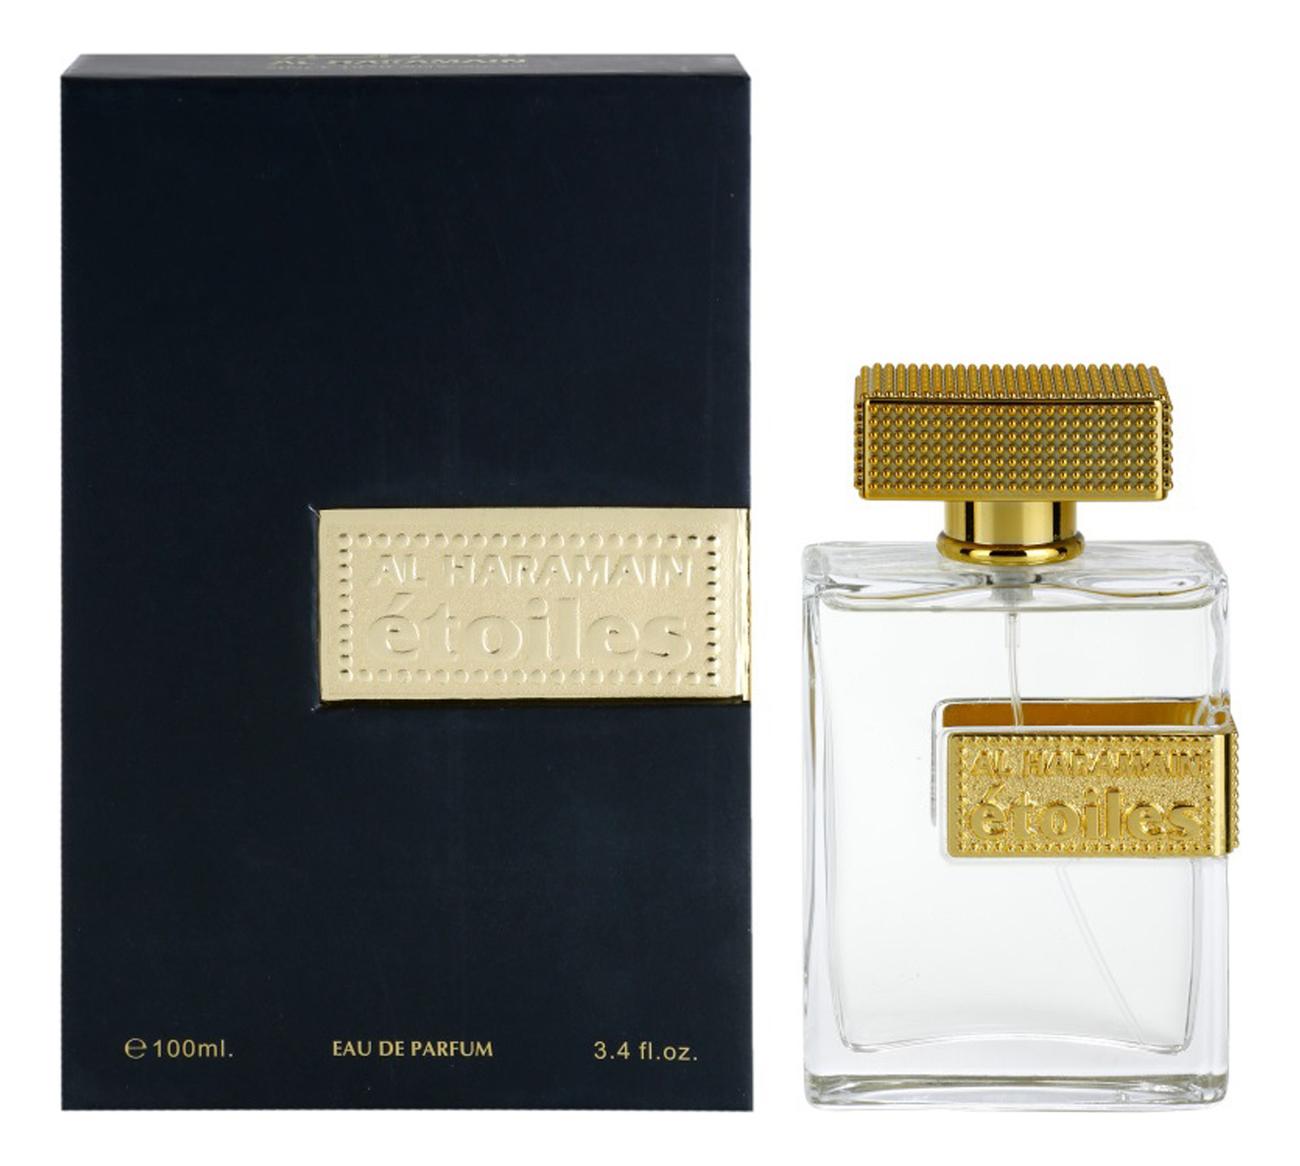 Al Haramain Perfumes Etoiles Gold: парфюмерная вода 100мл al haramain perfumes rain dance pink парфюмерная вода 100мл